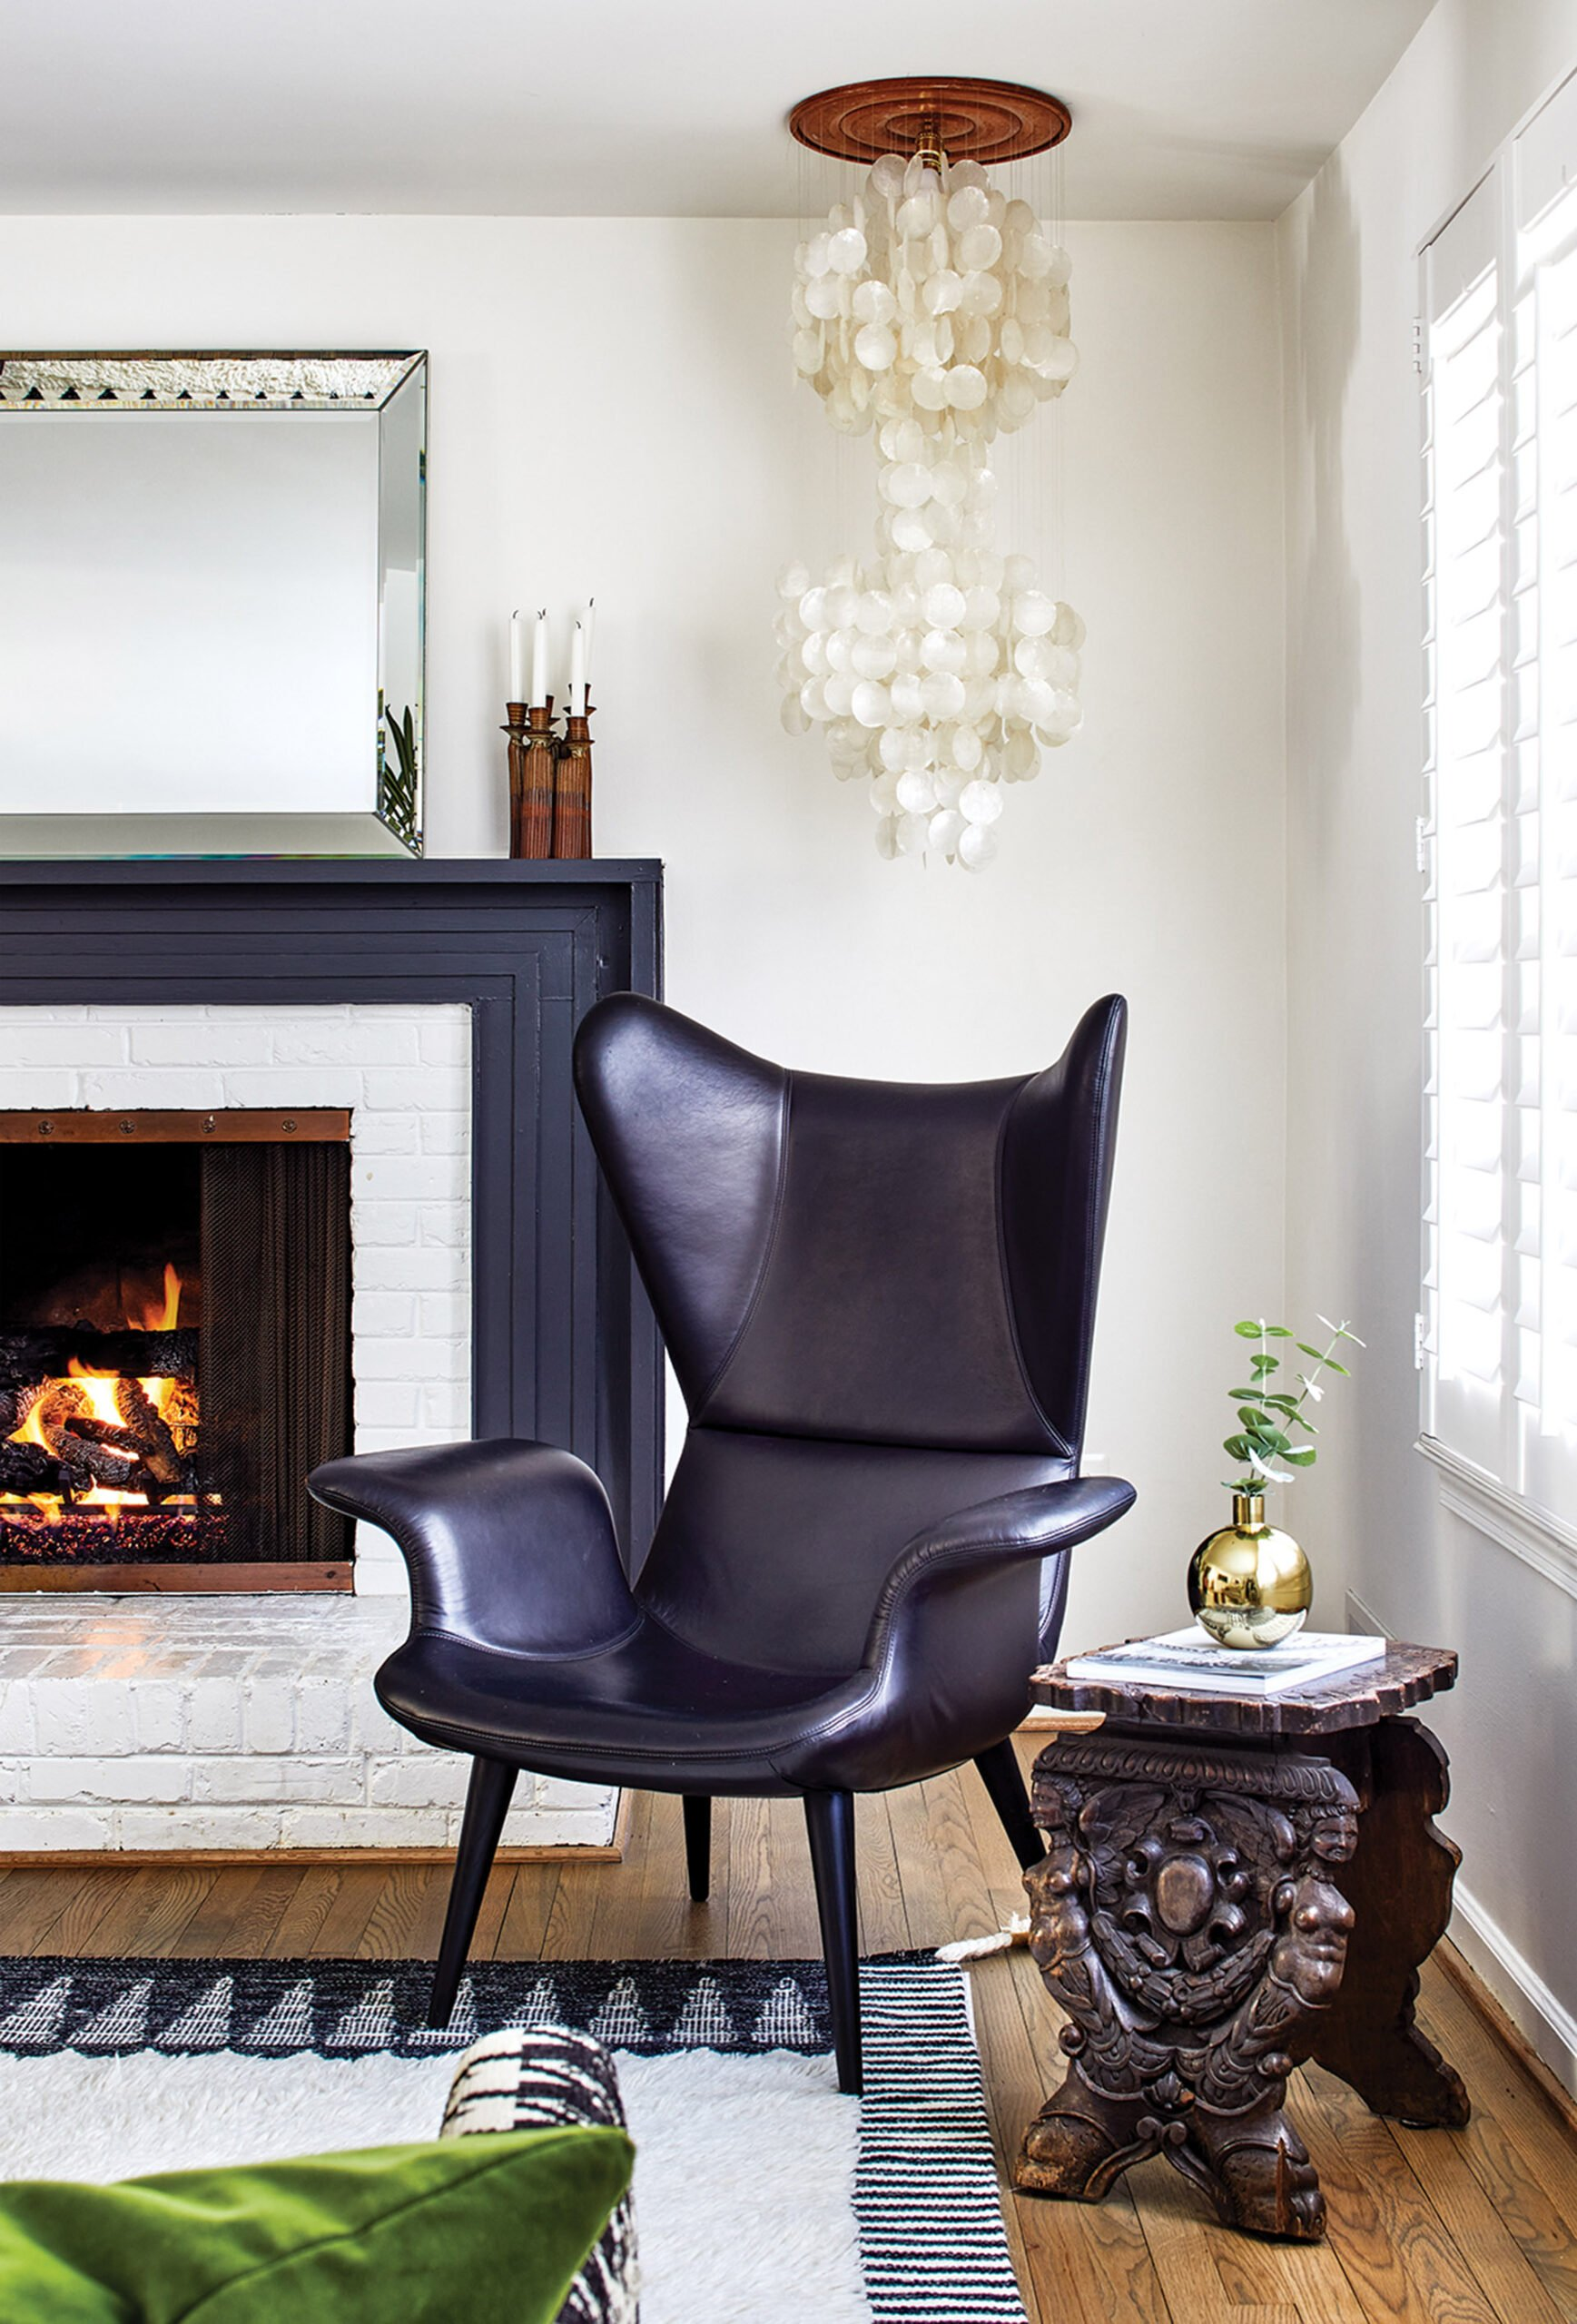 Living room, modern chair from Moroso's Diesel and 1860s European wedding stool.